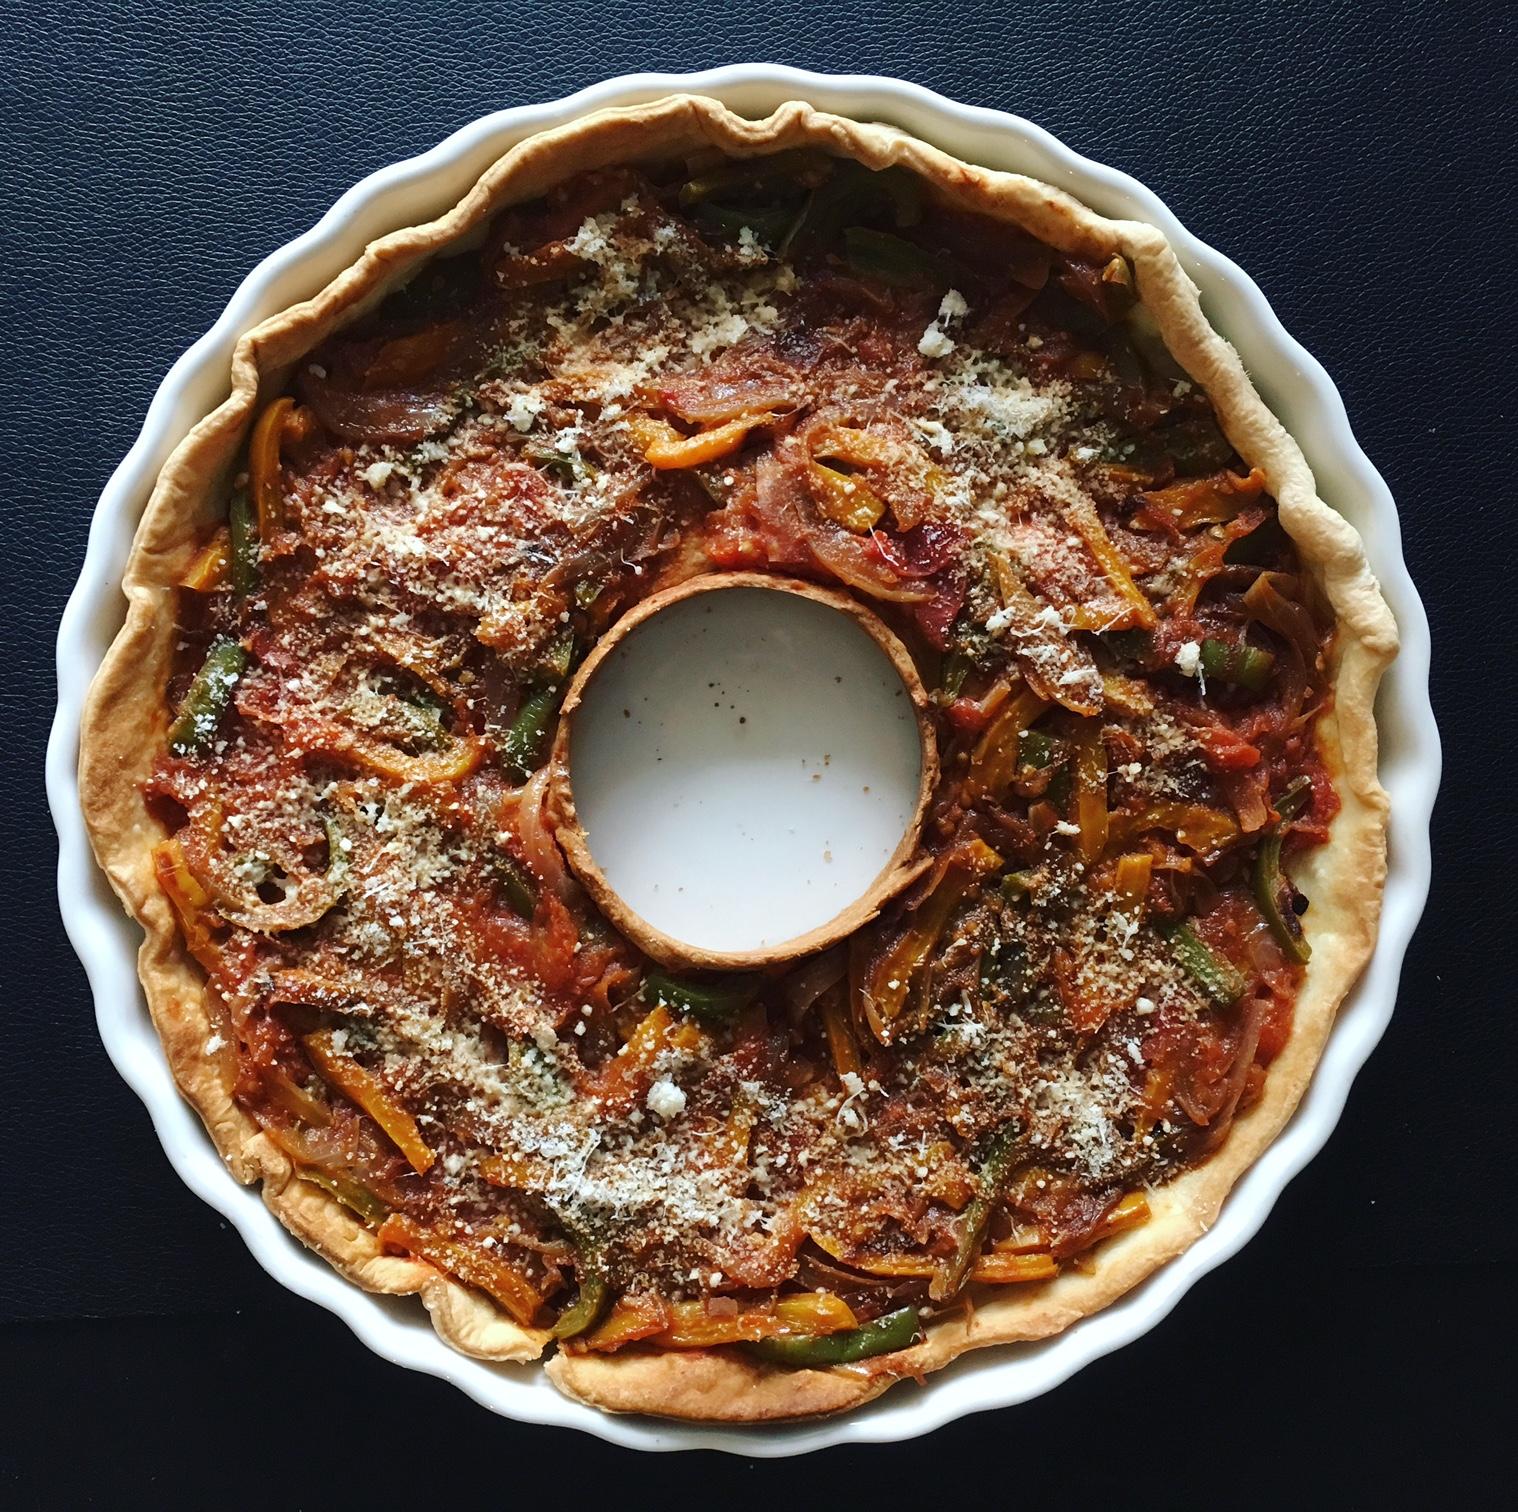 Tarte aux tomates, oignons et poivrons